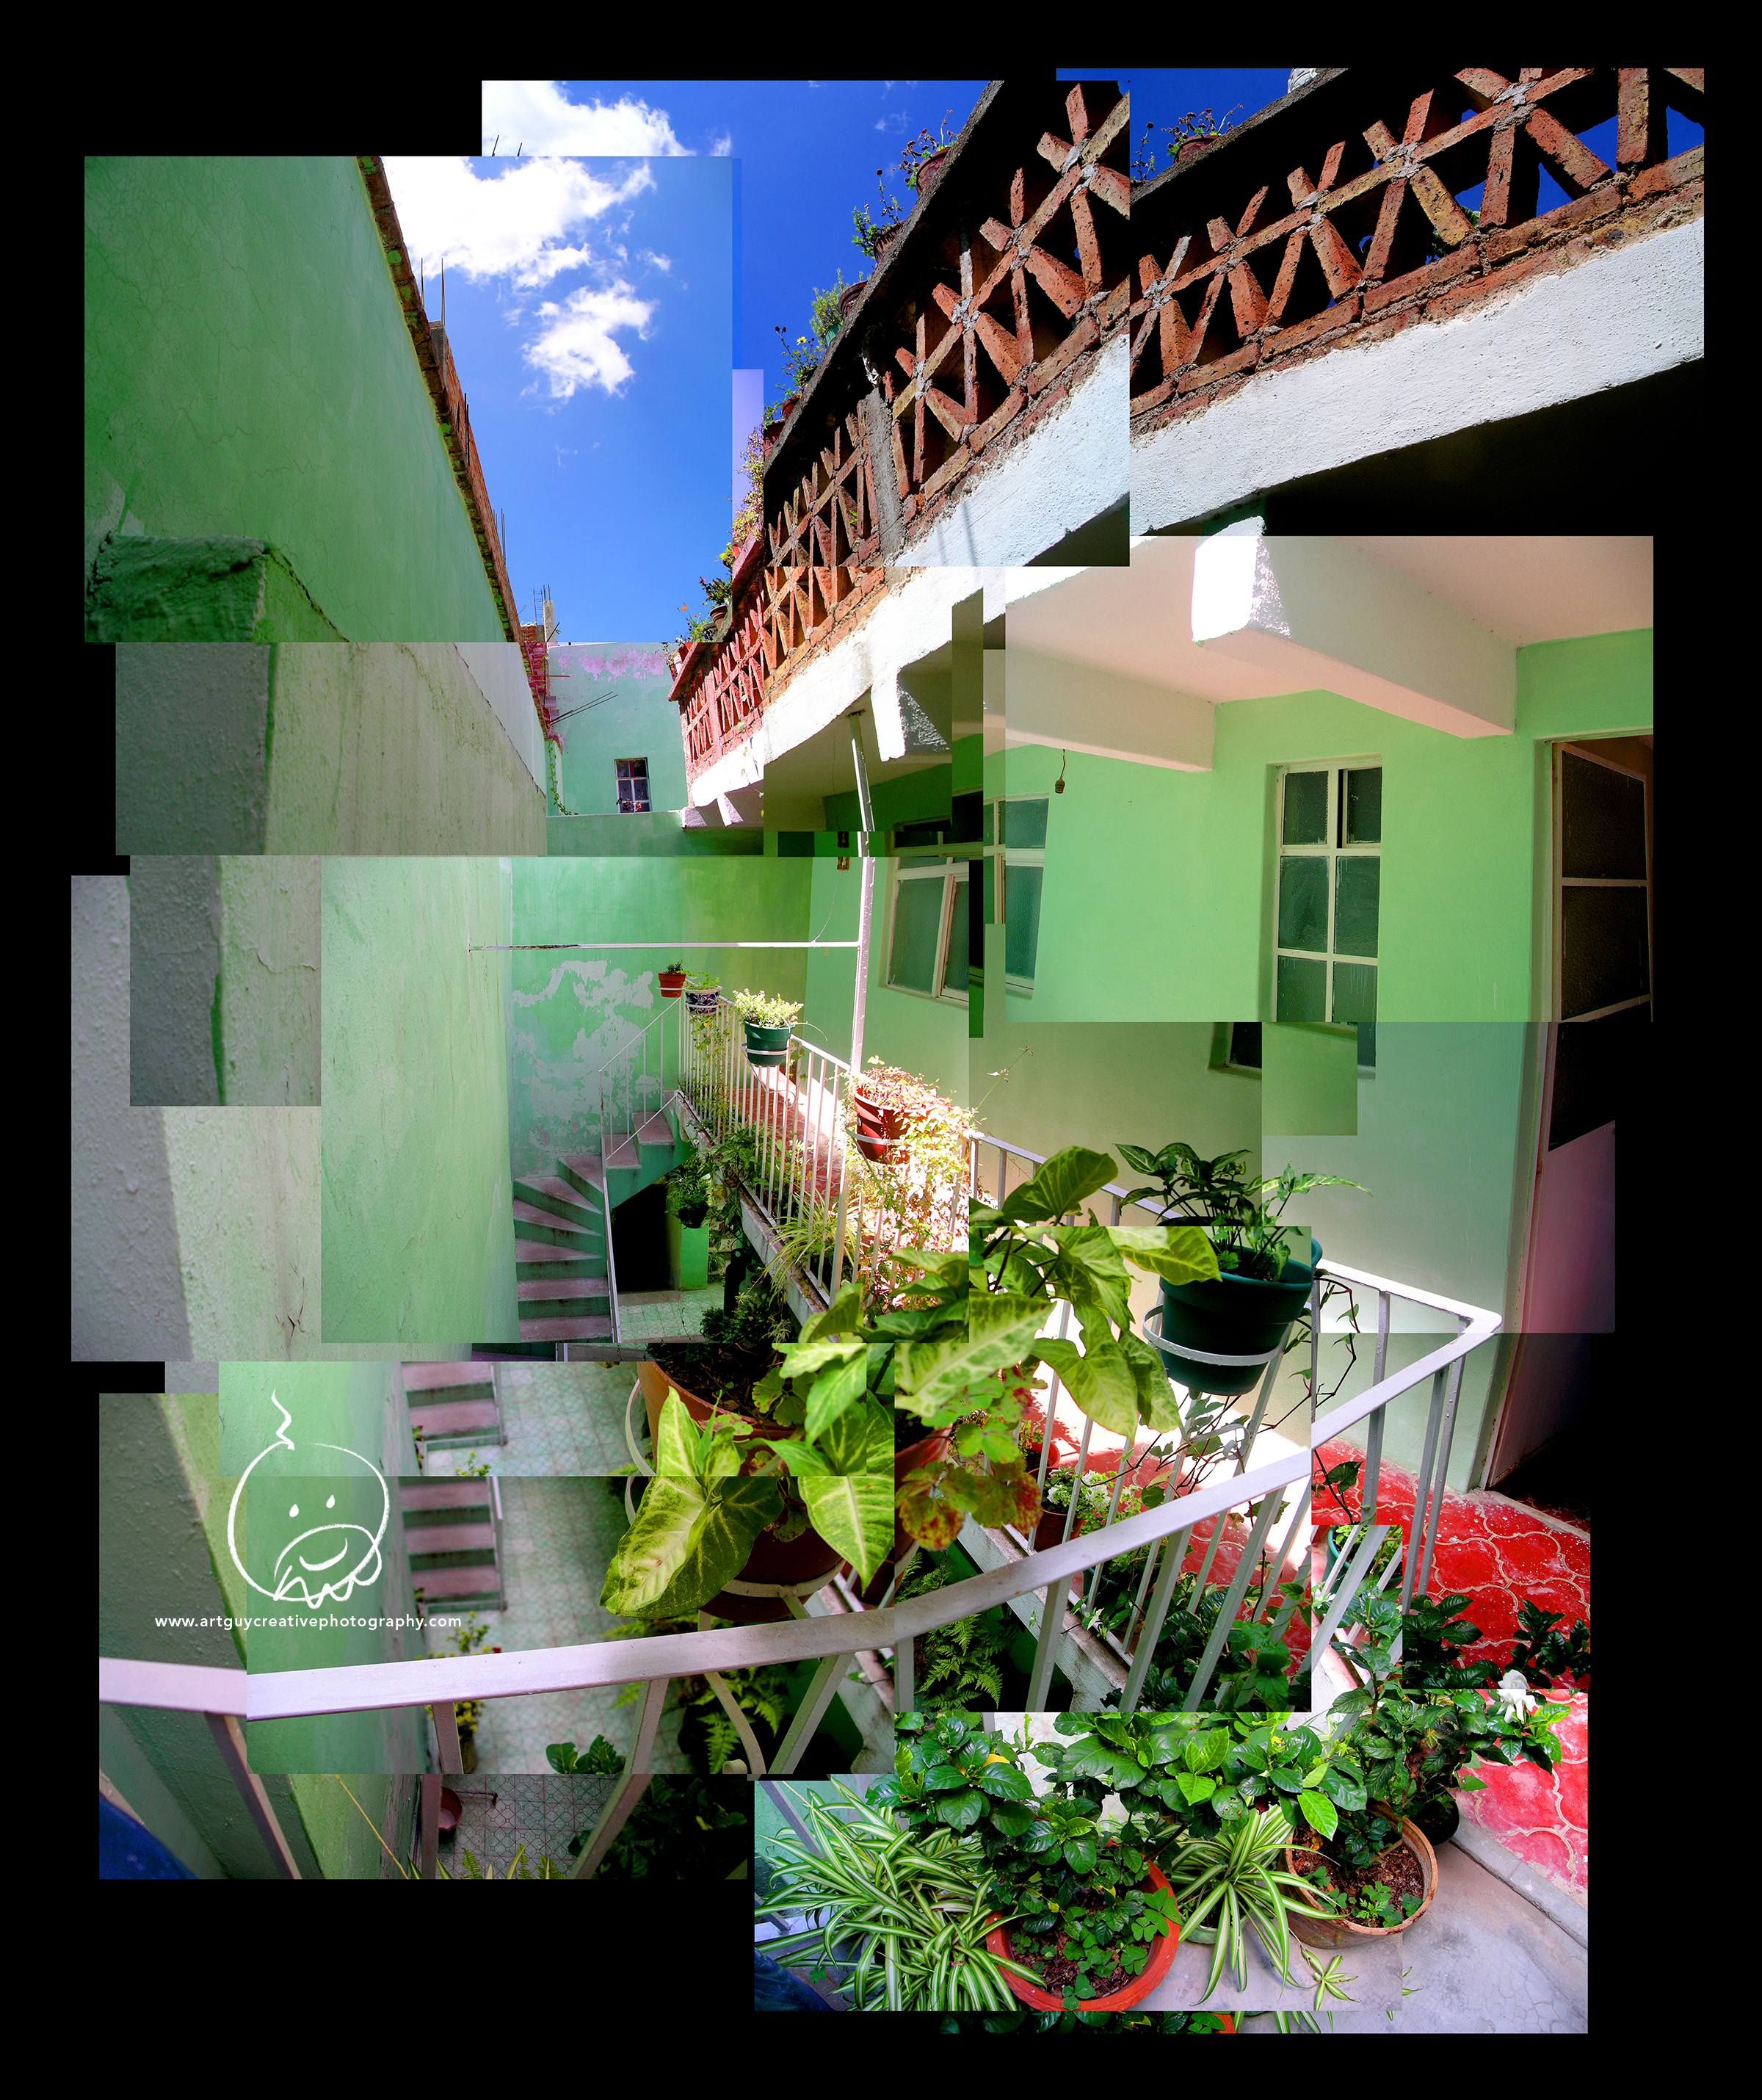 Guanajuato Mexico Montage Photography